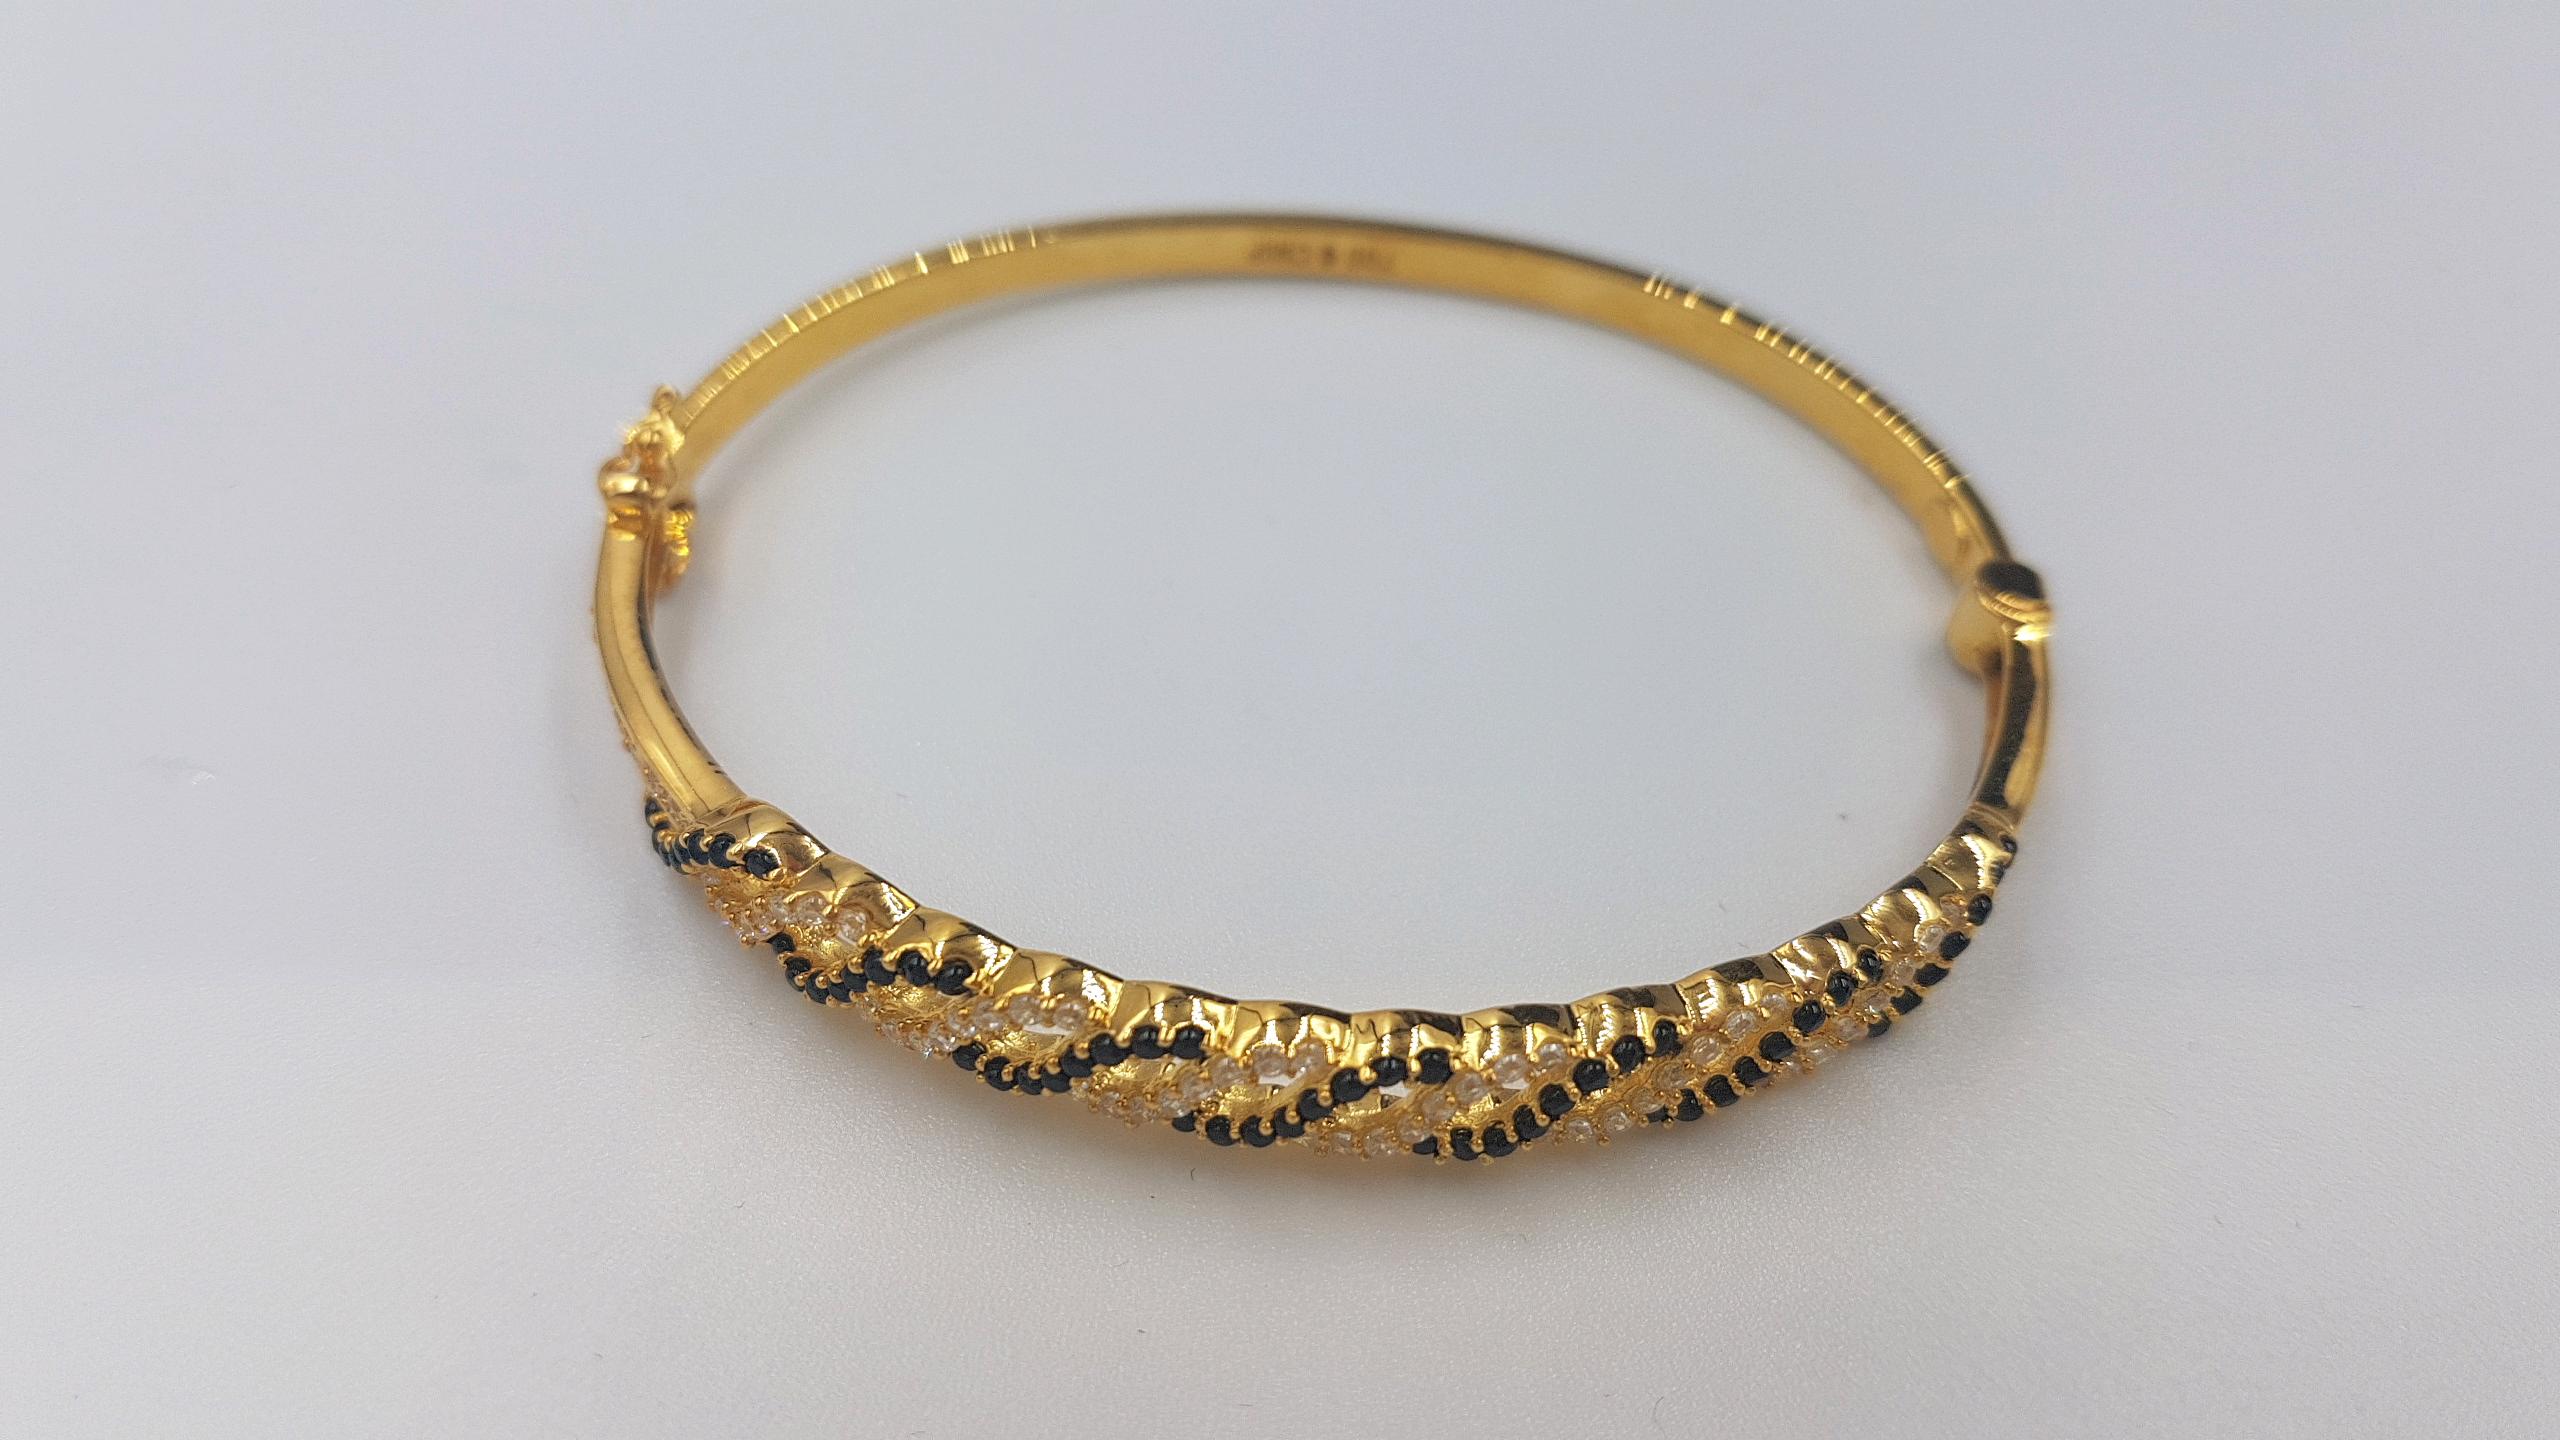 Jenis Gelang Emas Terpopuler Sepanjang Masa, Mana Pilihan Anda